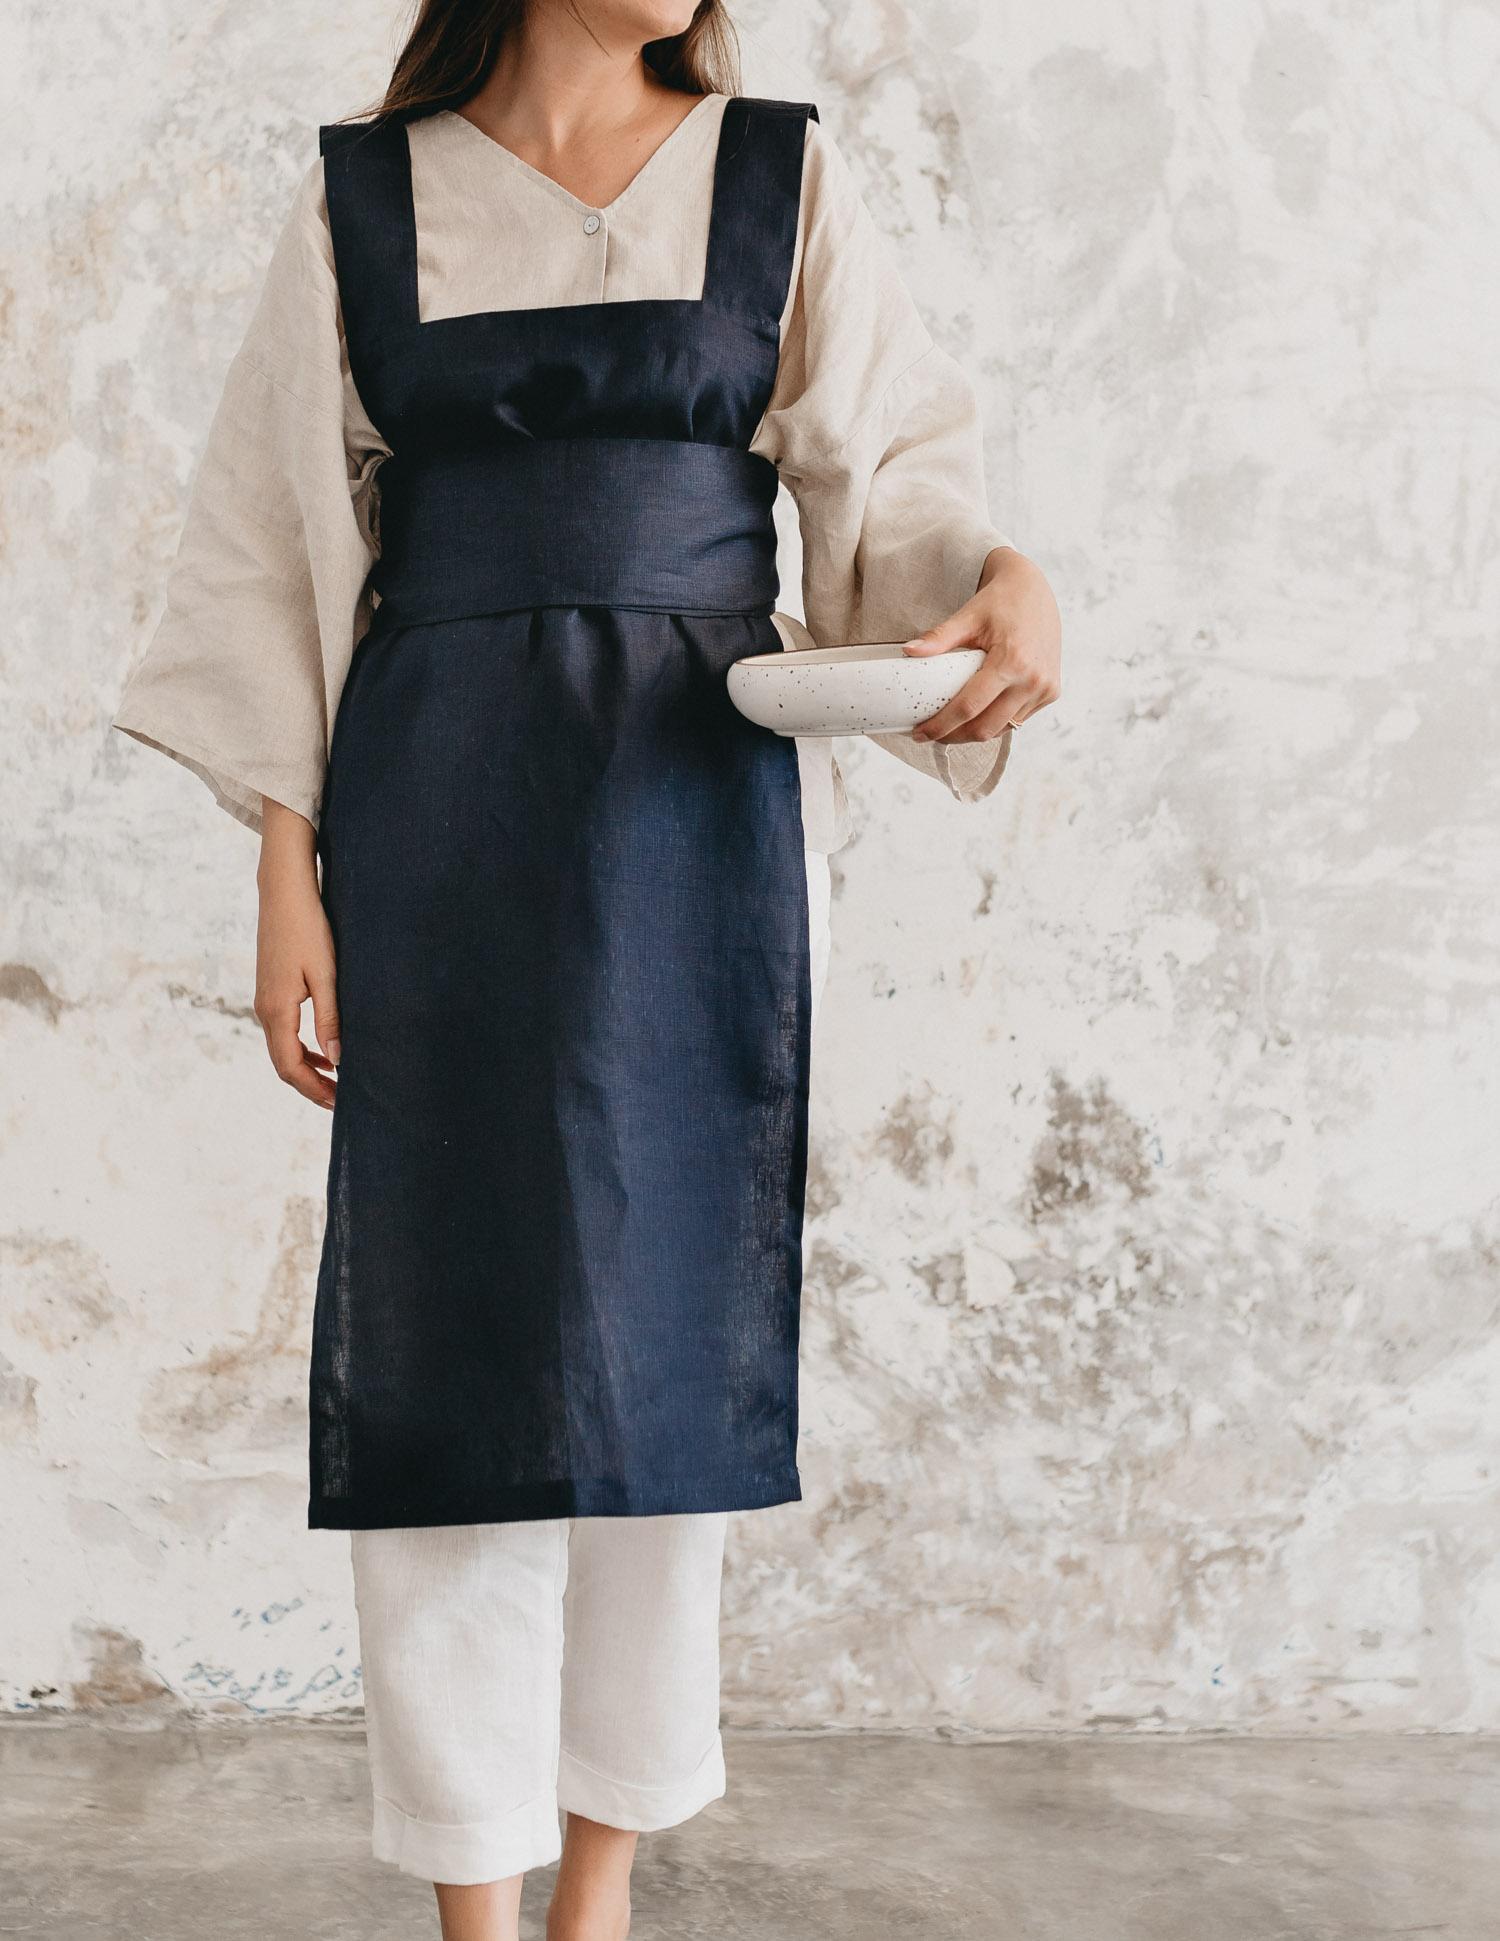 keira-mason-nowhere-and-everywhere-navy-linen-apron.jpg